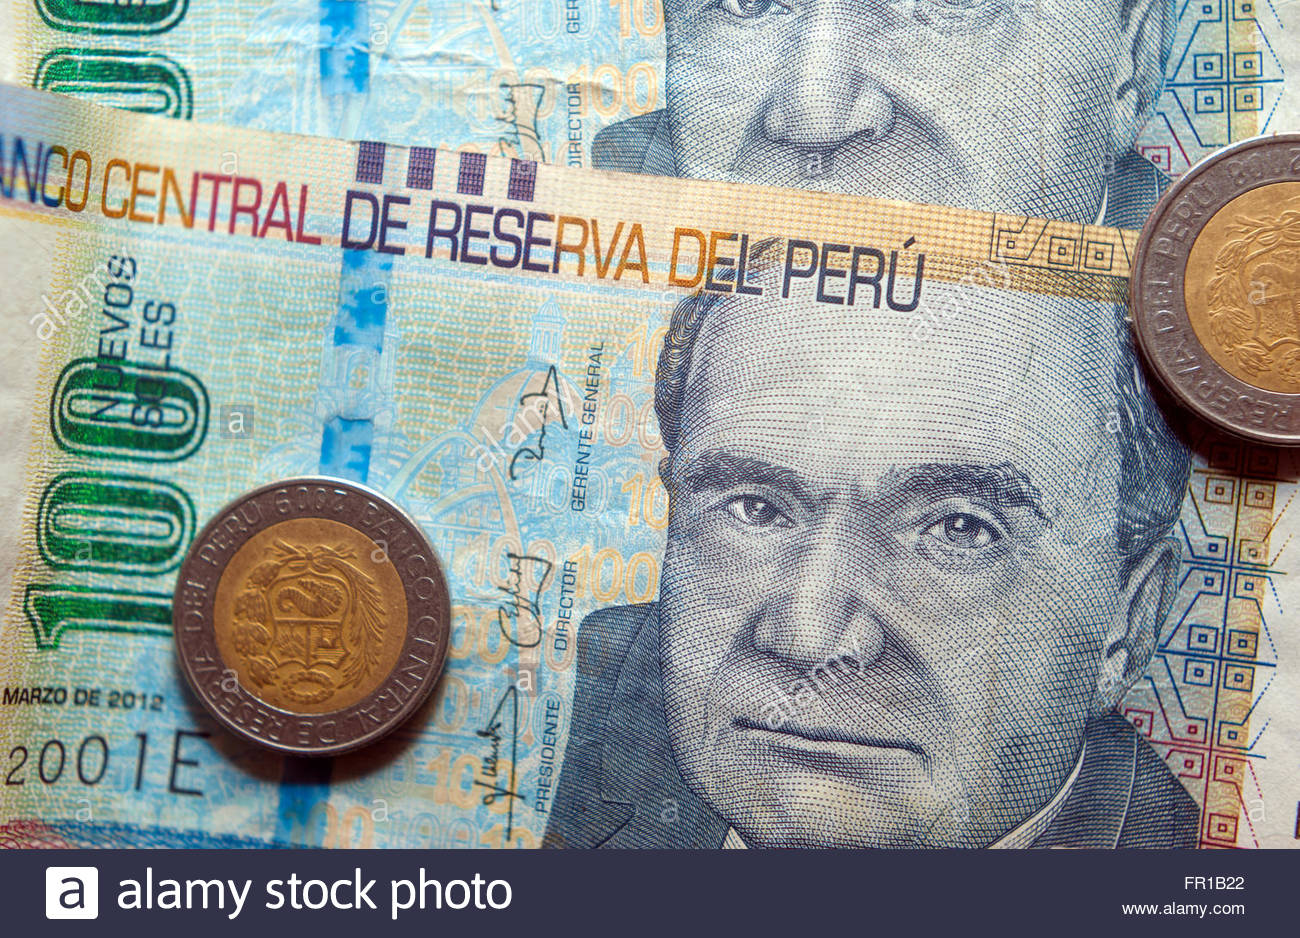 Notes geld trading imgenes de stock notes geld trading fotos de soles peruanos per sol billetes y monedas imagen de stock thecheapjerseys Images